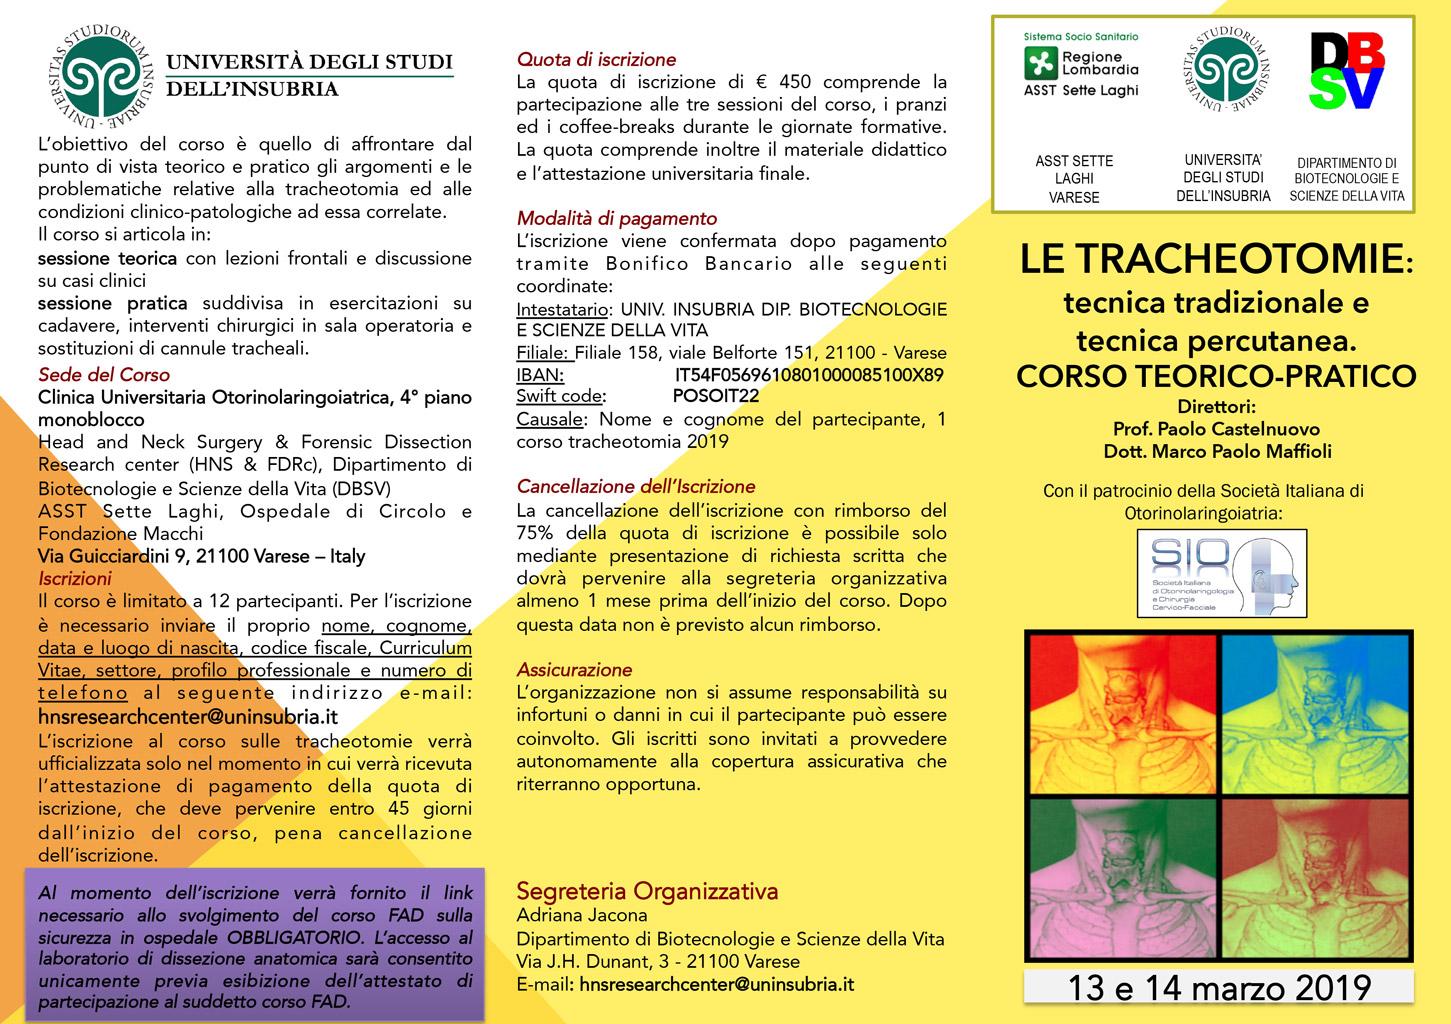 Tracheo-marzo-2019-1